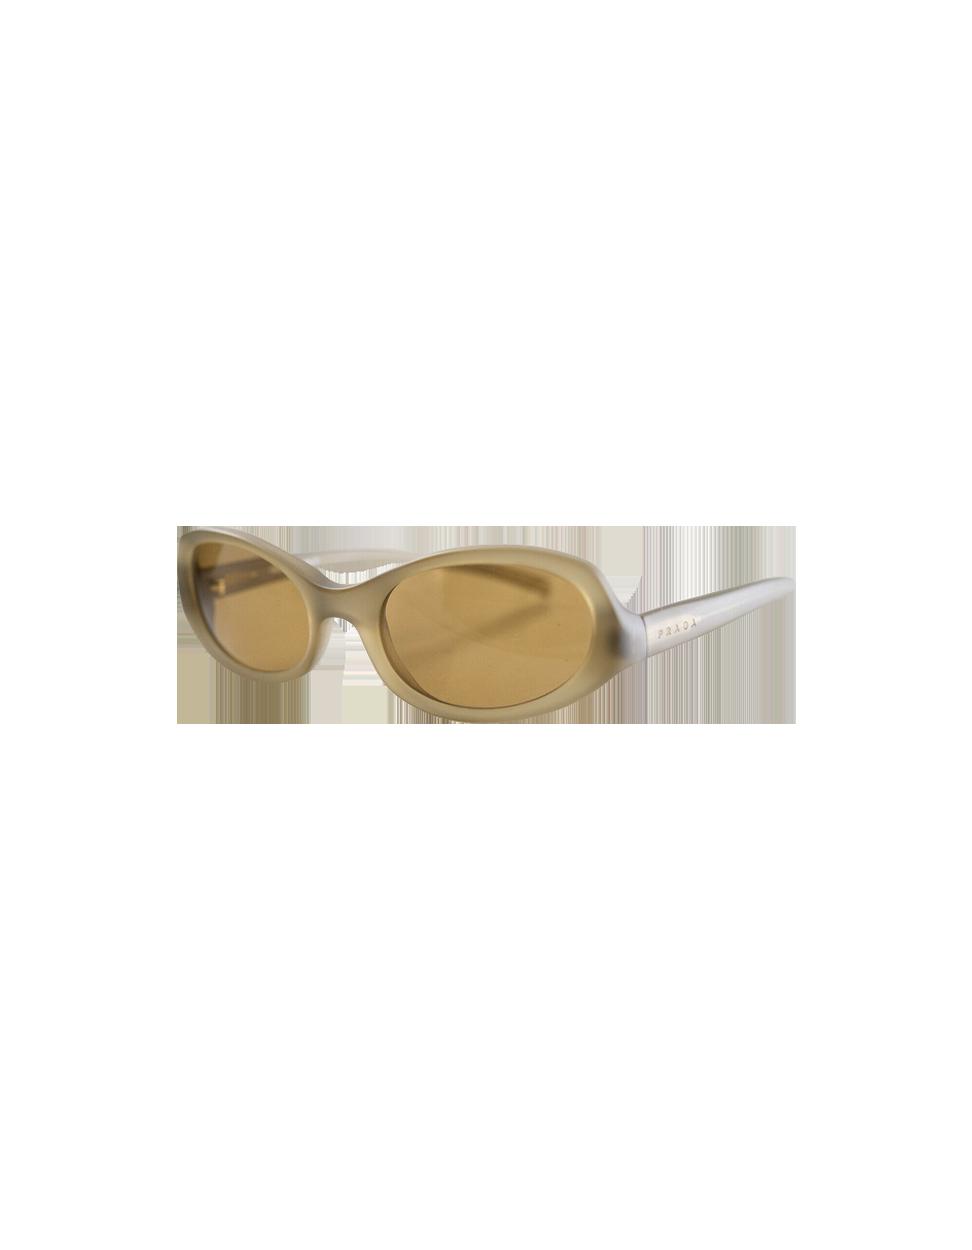 prada-sports-shades